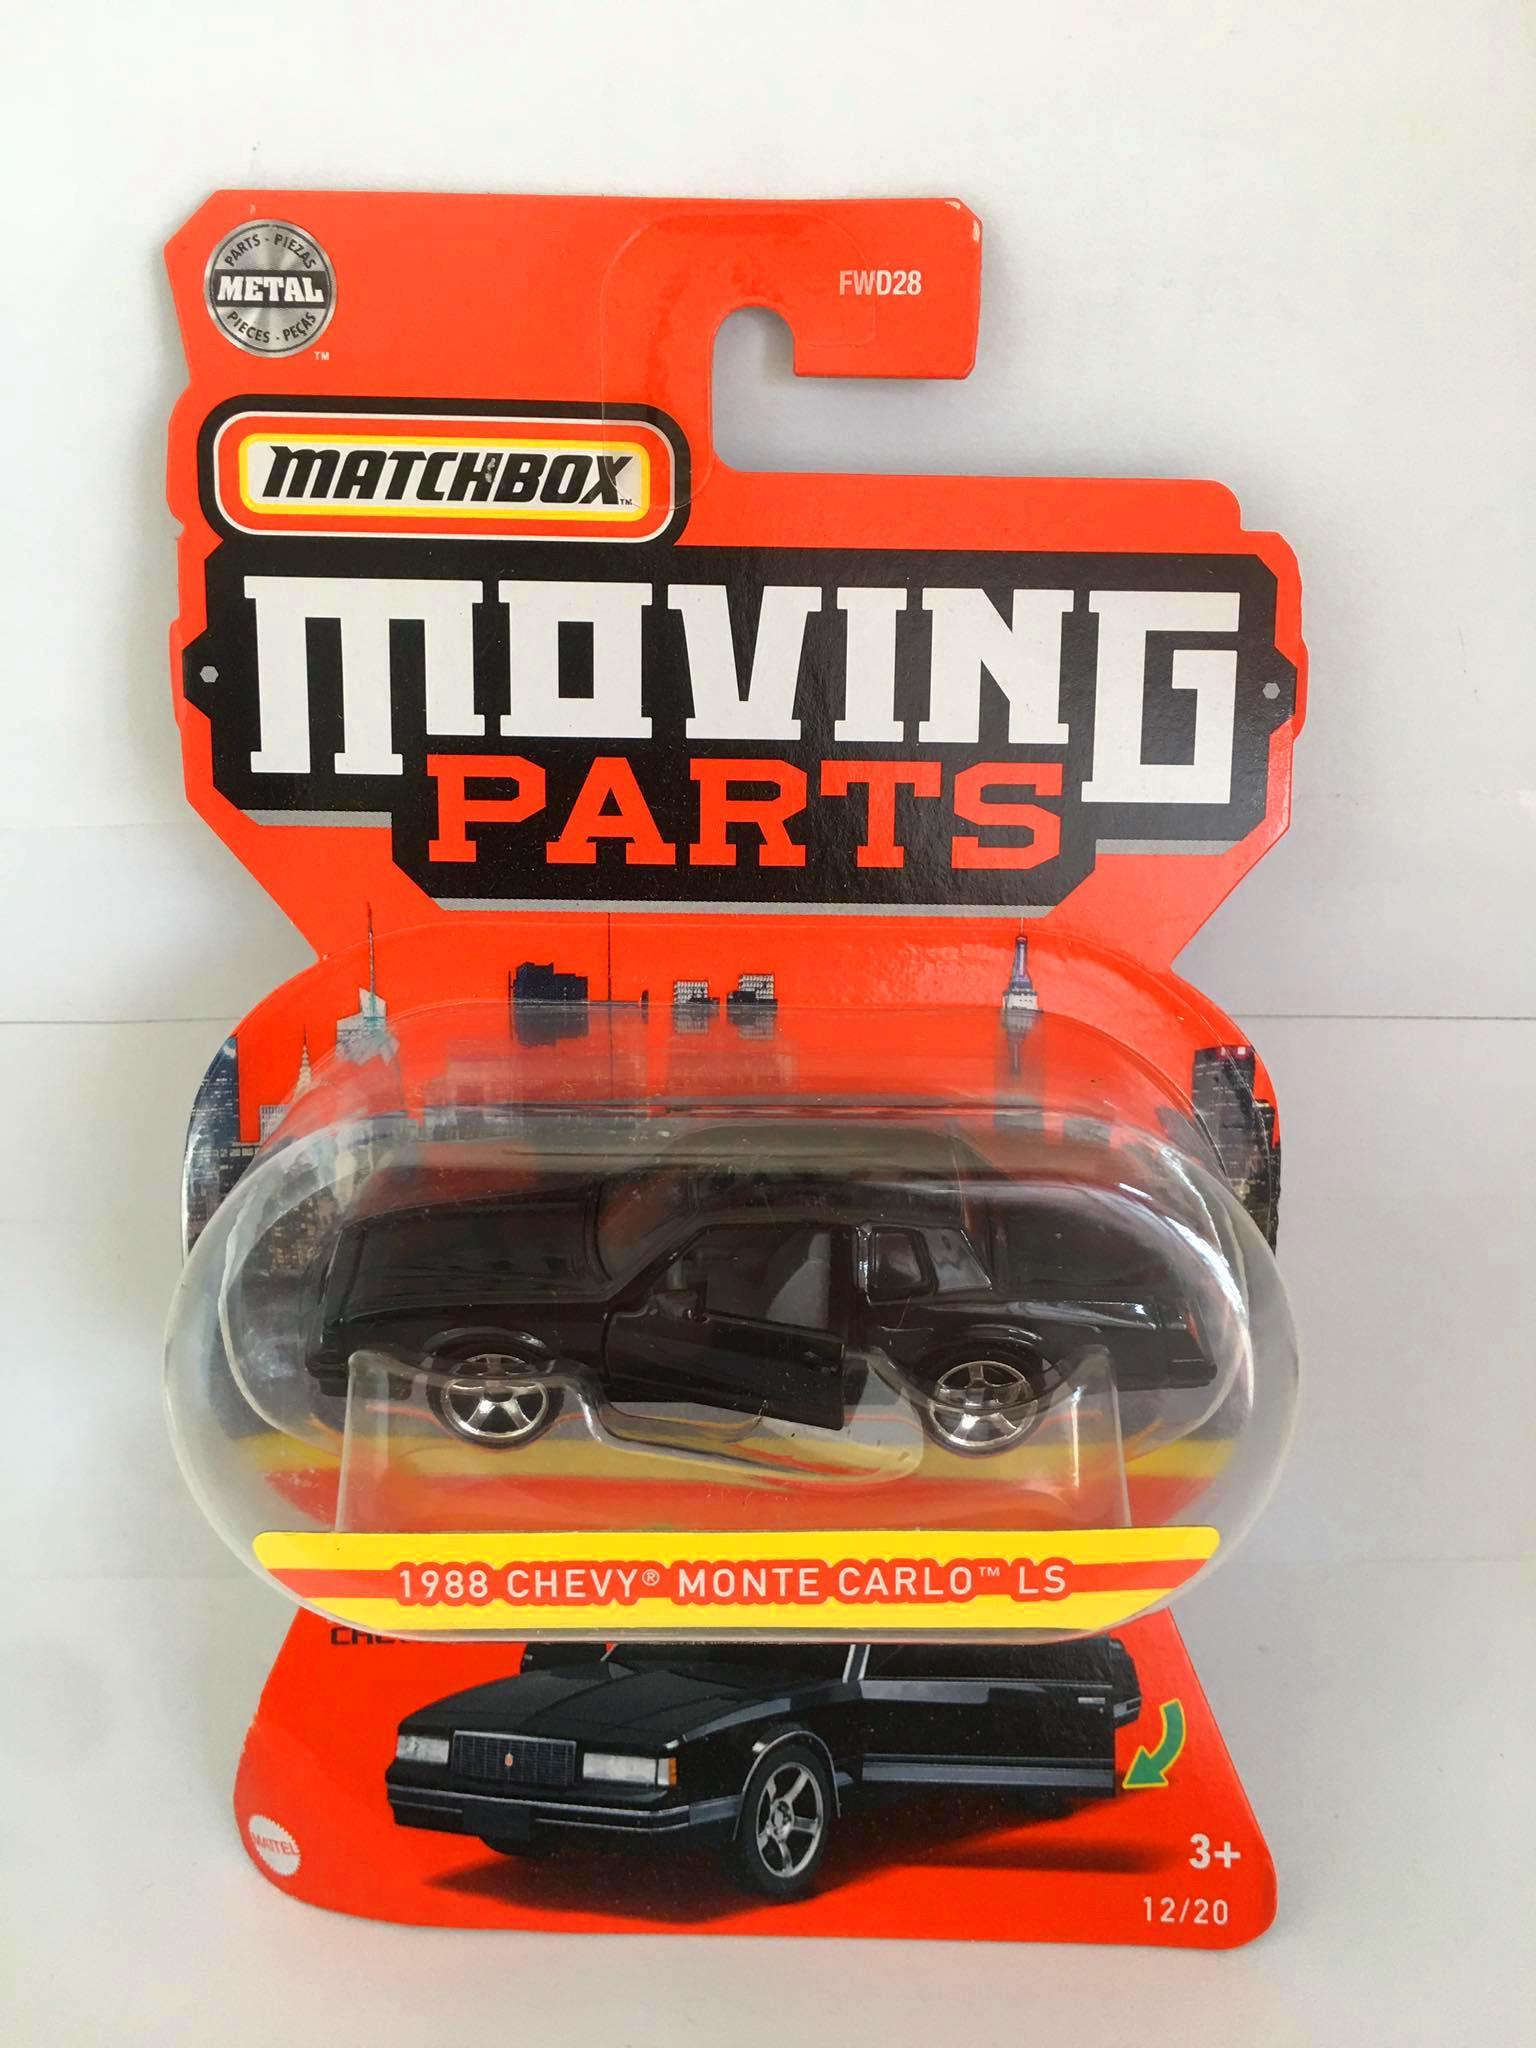 Matchbox - 1988 Chevy Monte Carlo LS Preto - Moving Parts